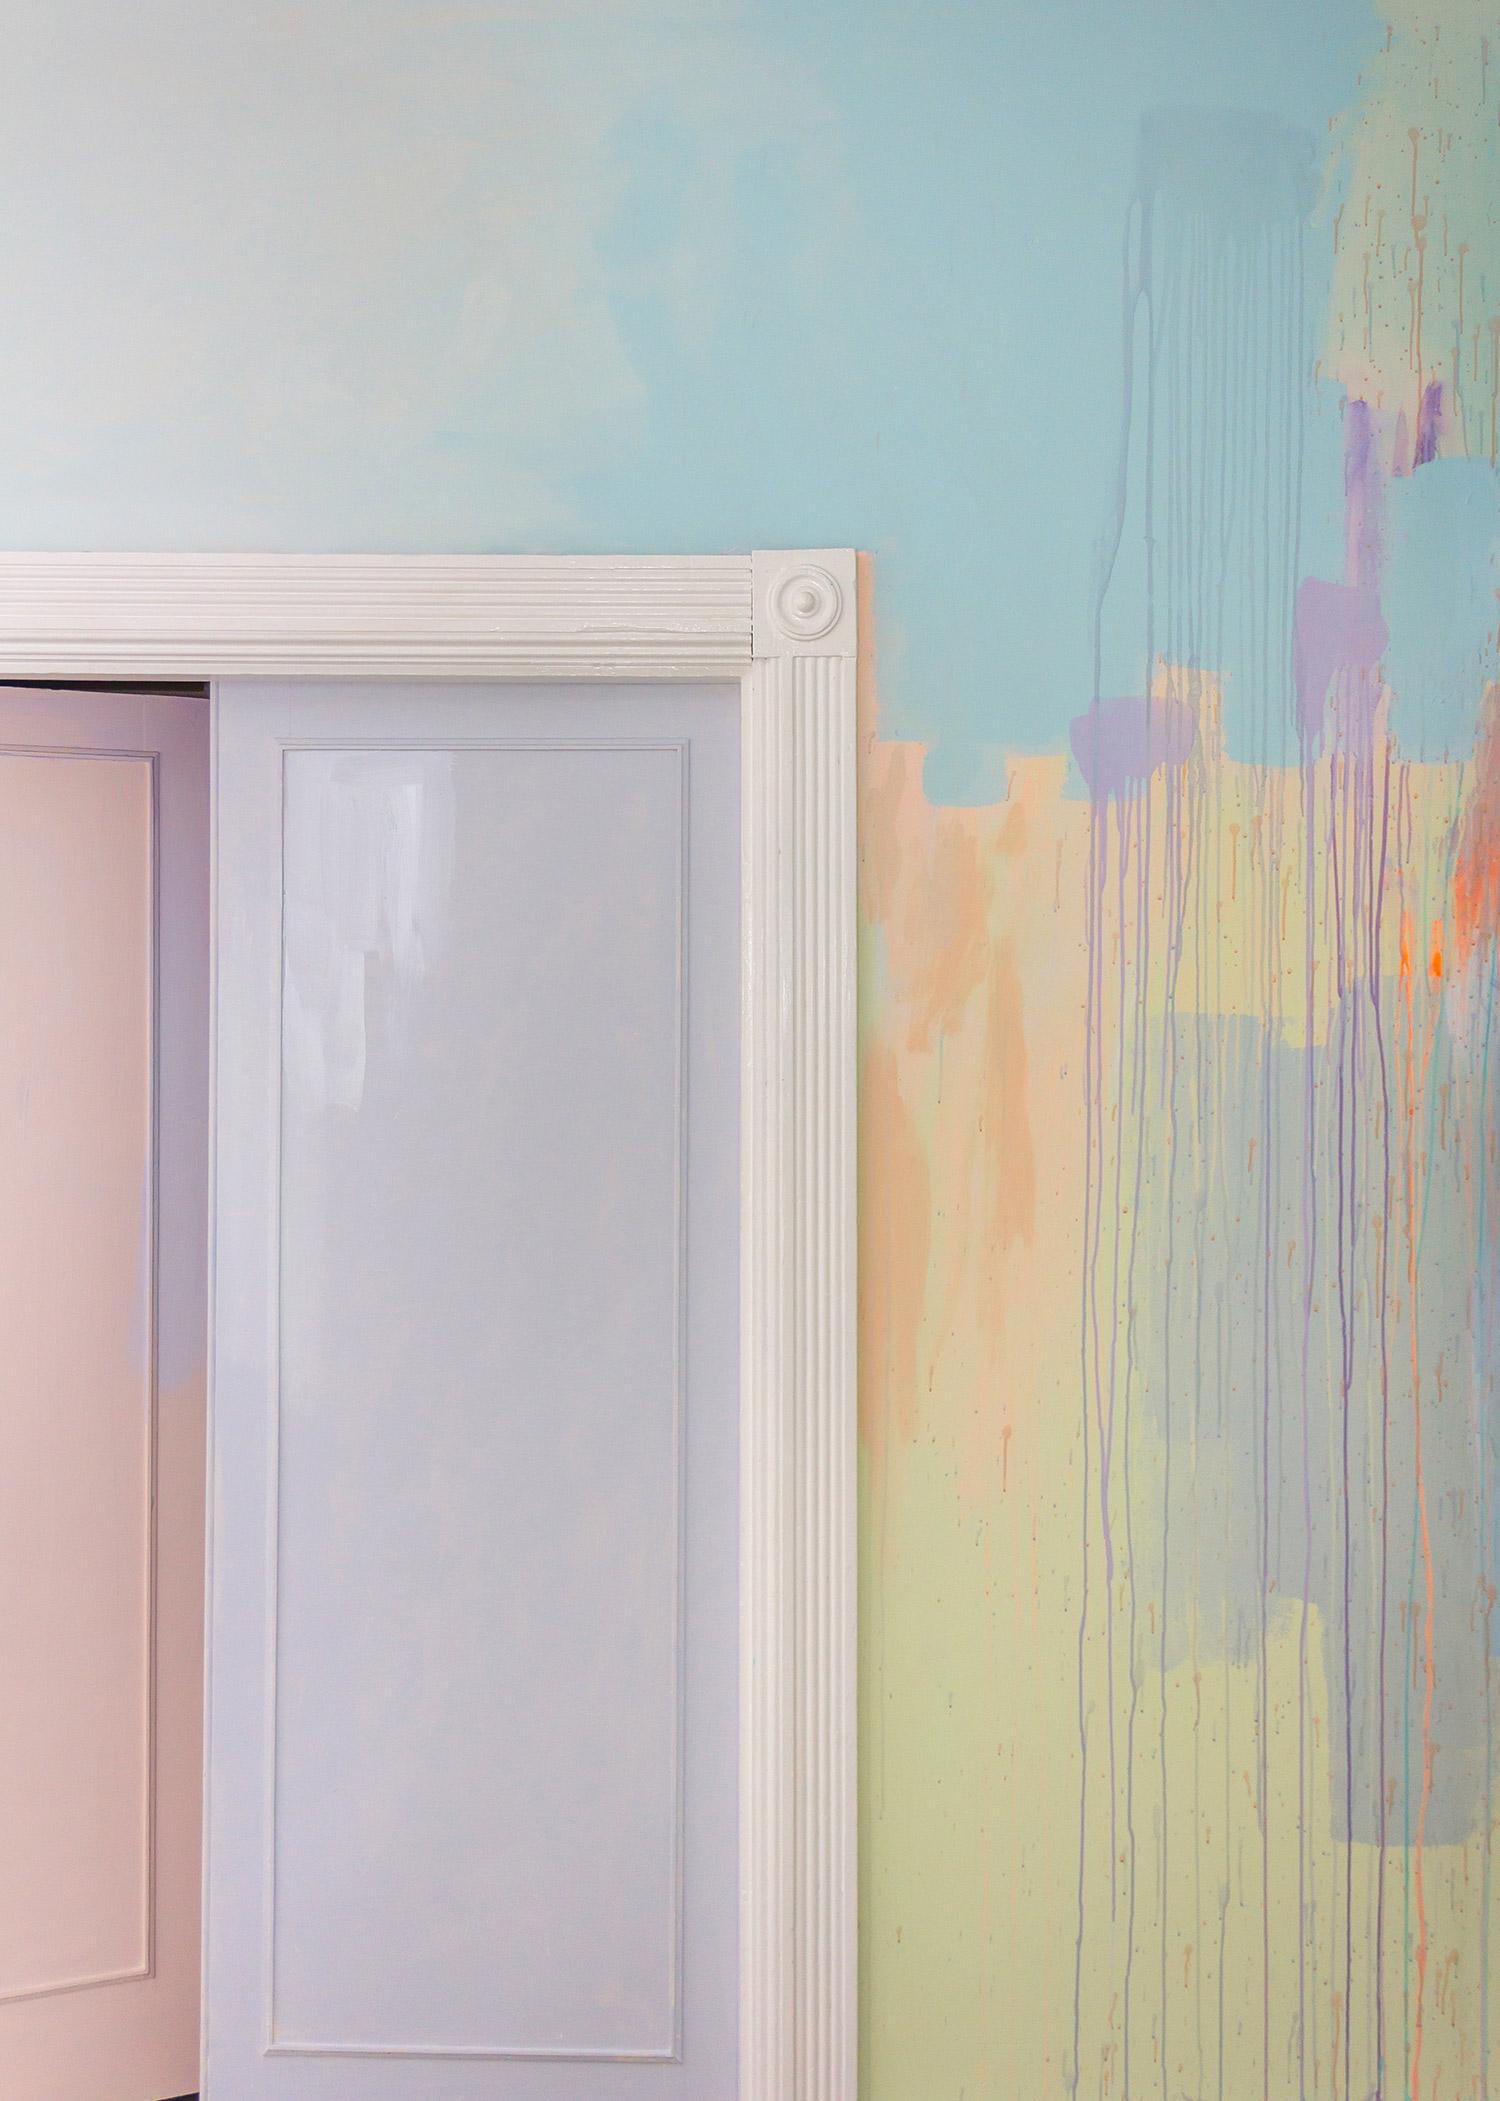 mural-pastel-magical-child-camillejaval-03.jpg